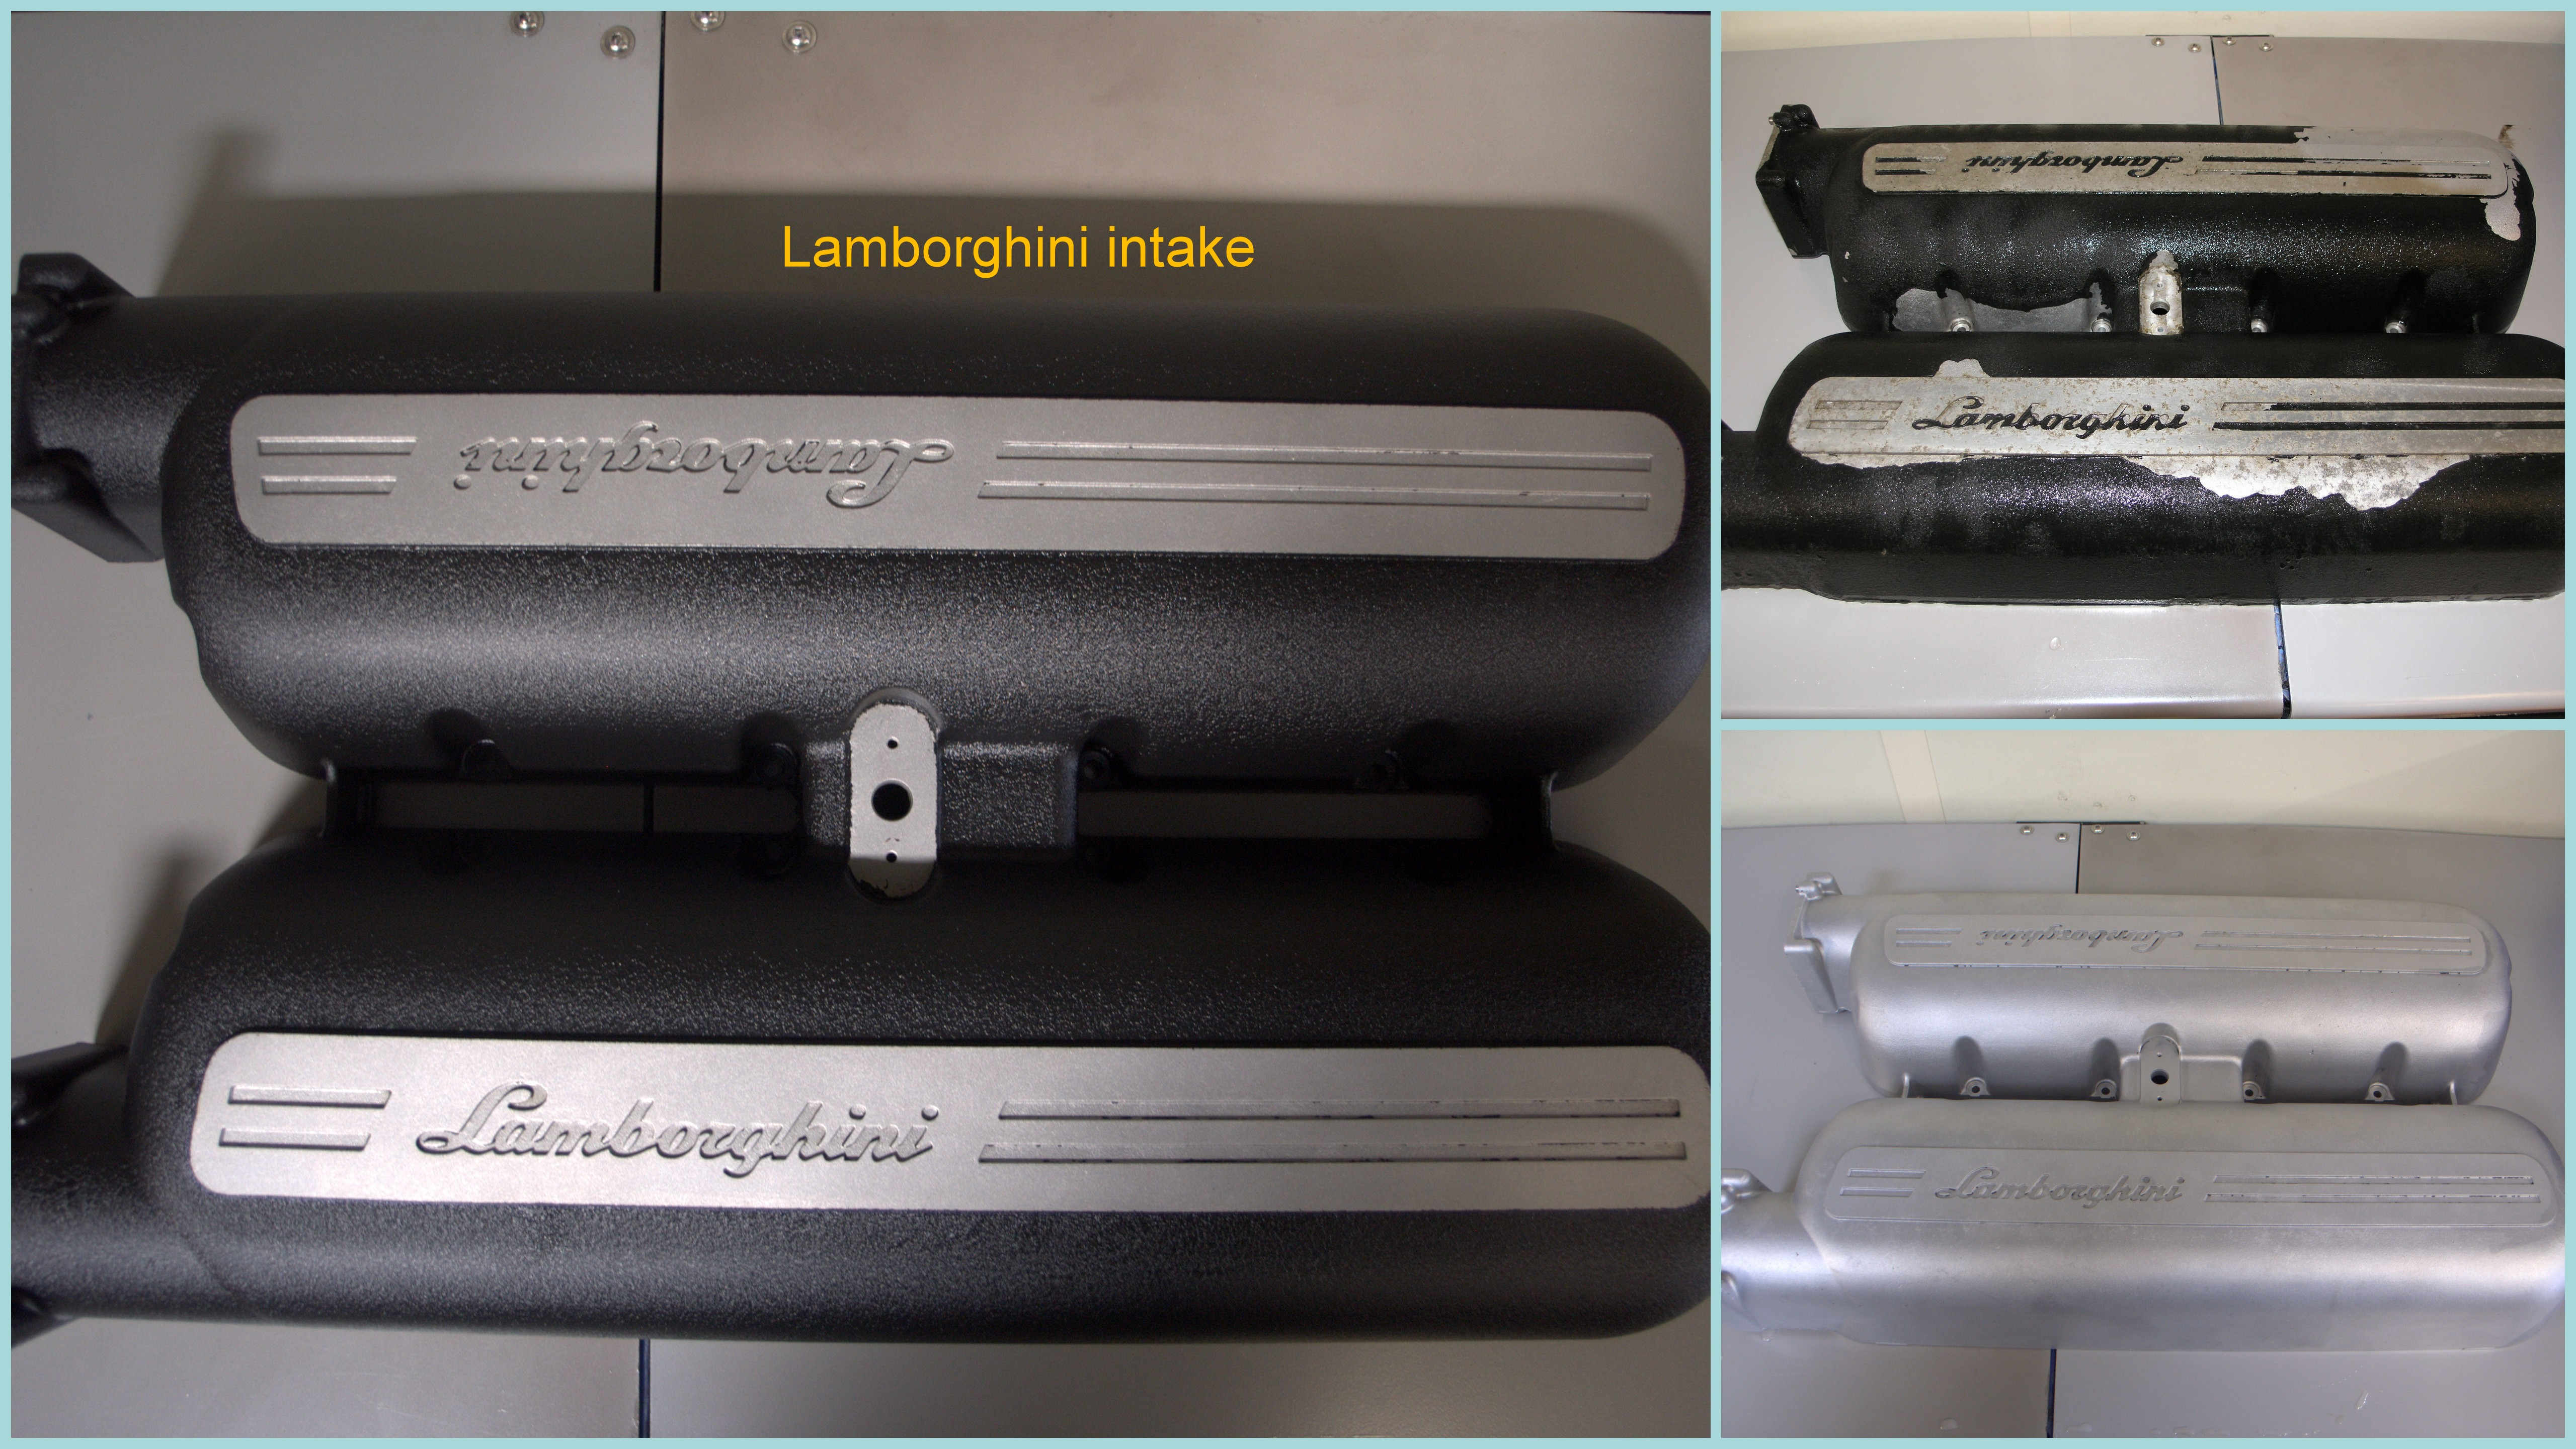 Lamborghini intake